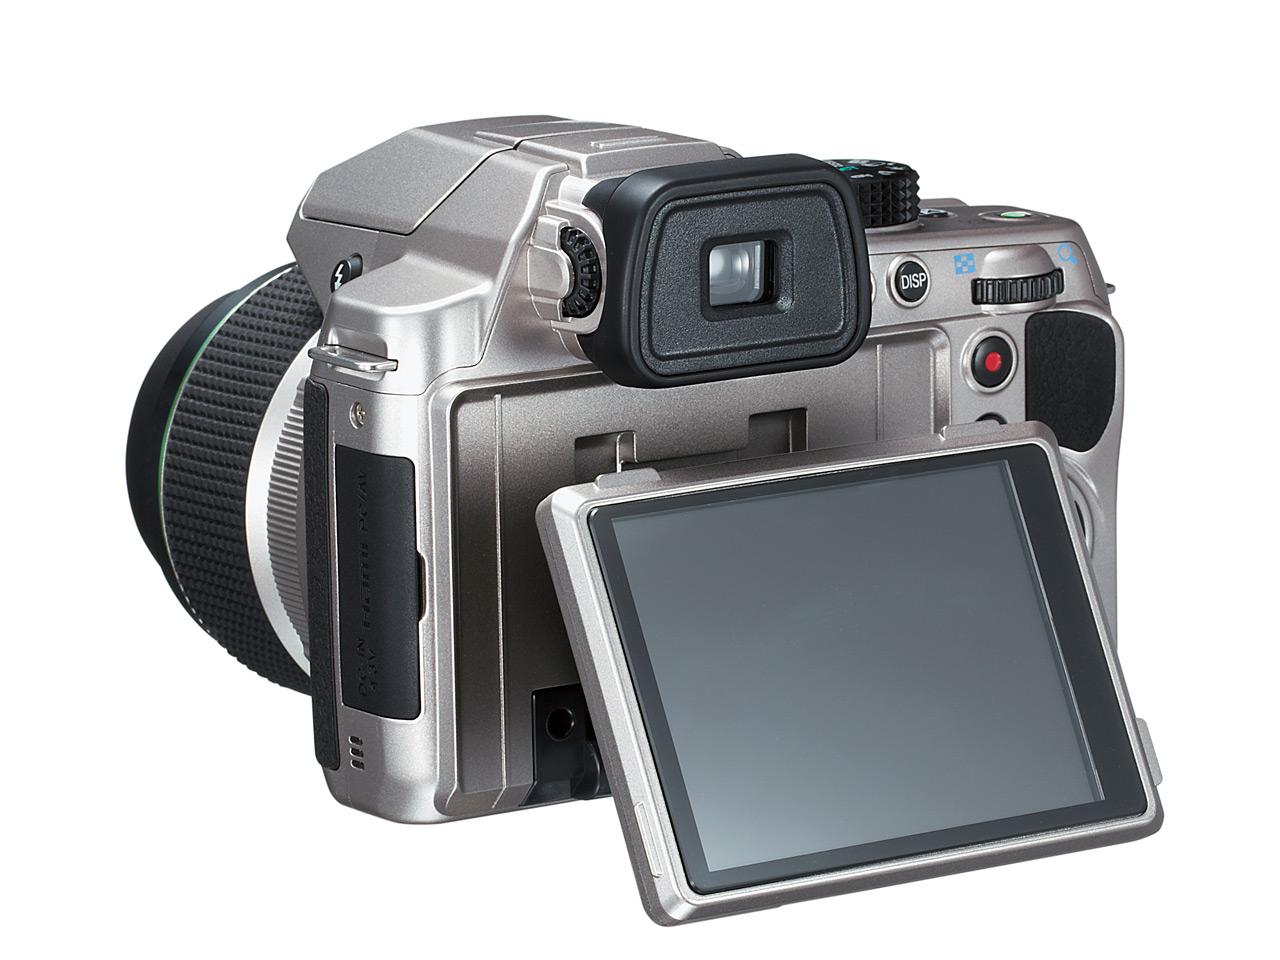 Camera Digital Camera Like Dslr pentax announces x 5 dslr like 26x zoom 16mp cmos superzoom additional images